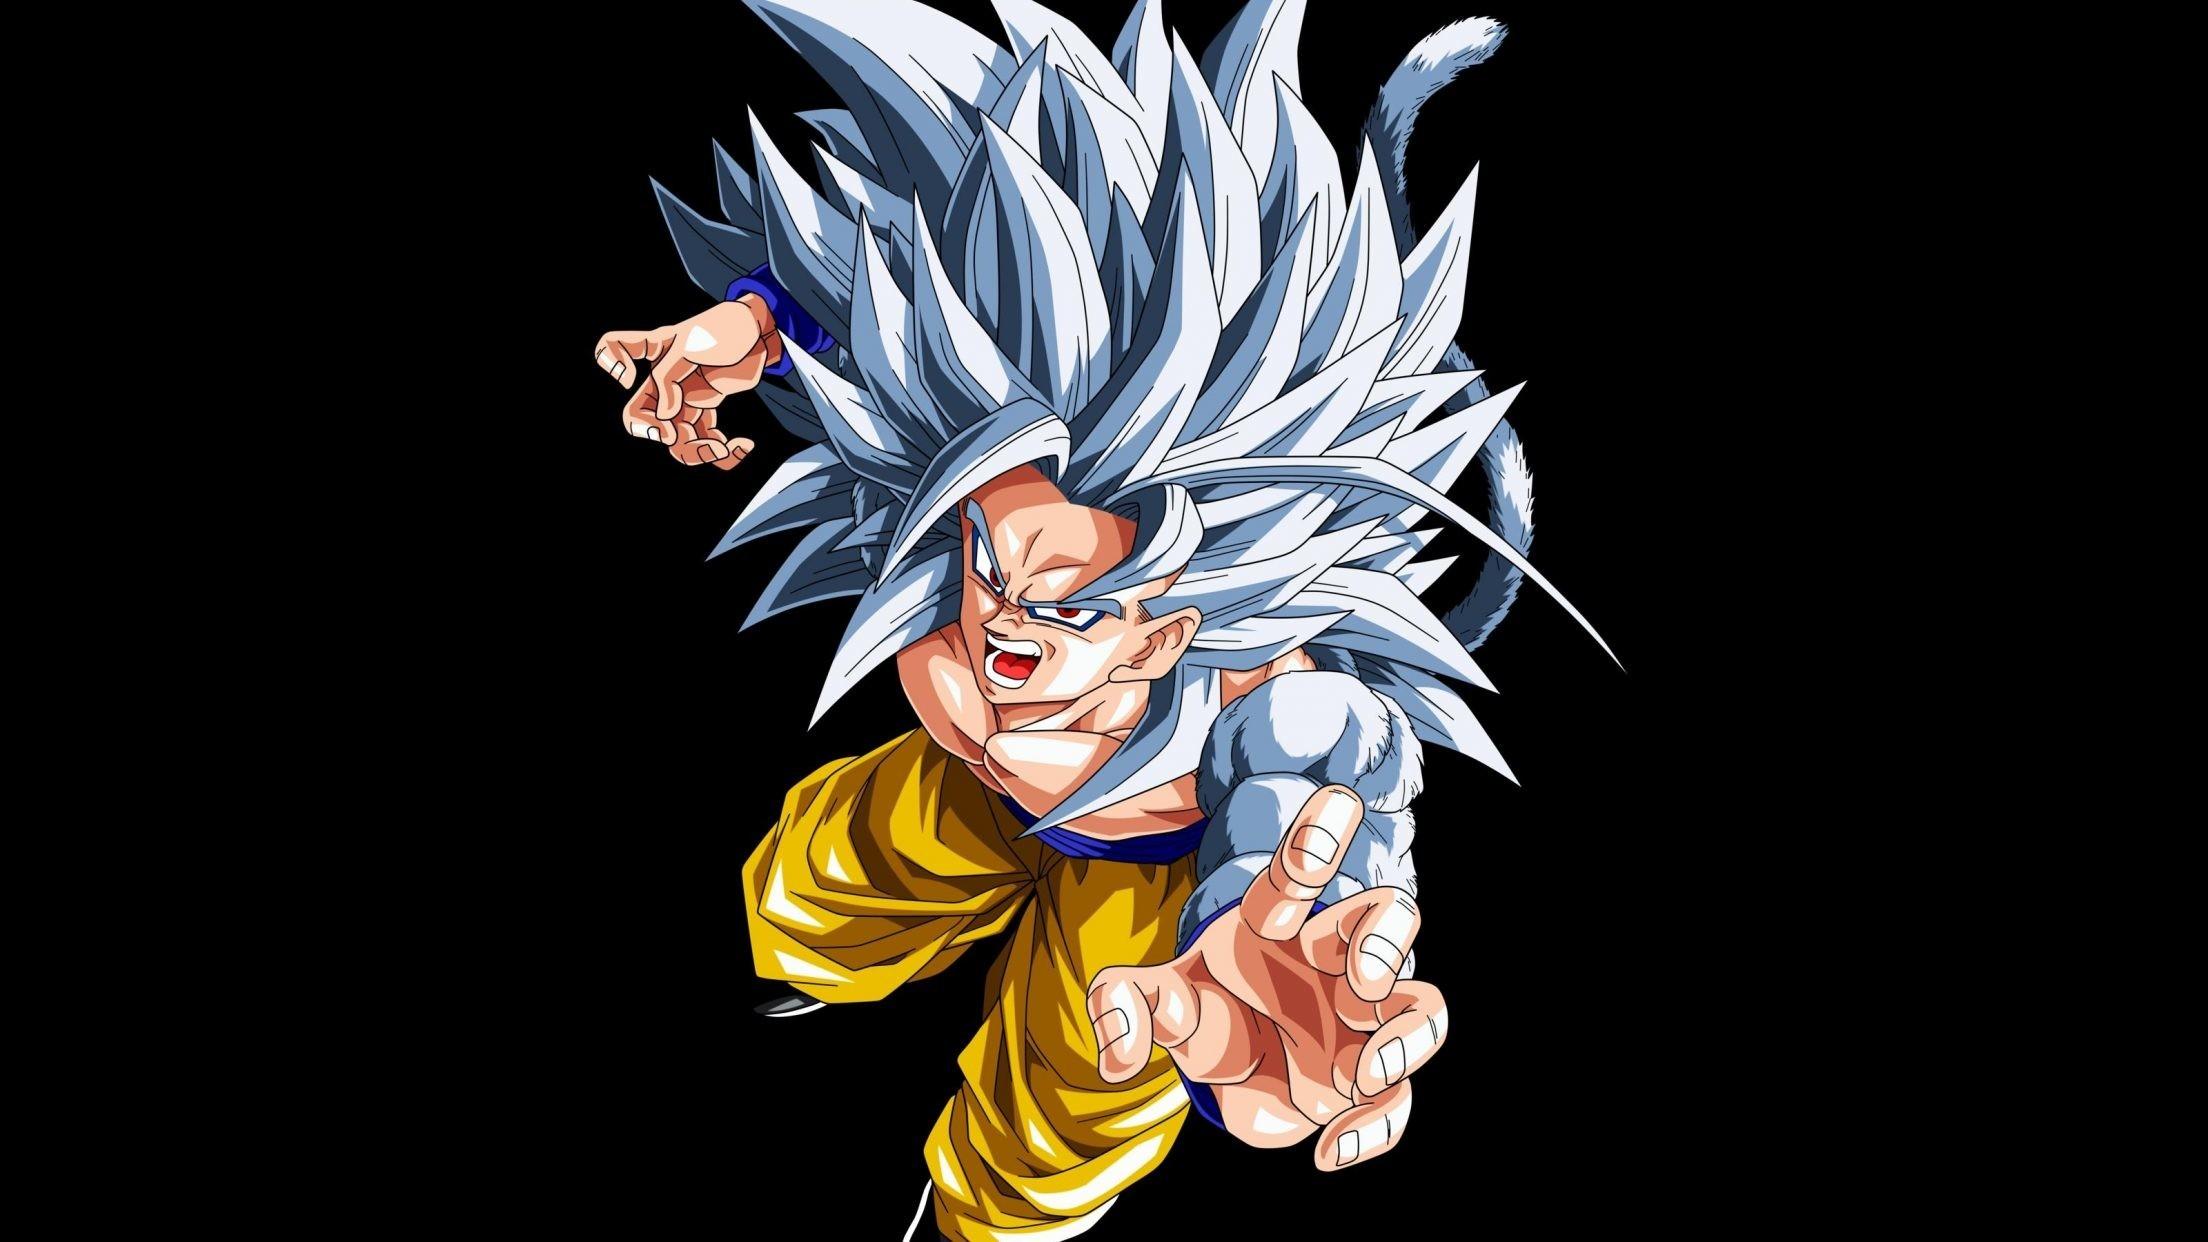 Goku Ssj5 Fondo De Pantalla Hd Fondo De Escritorio